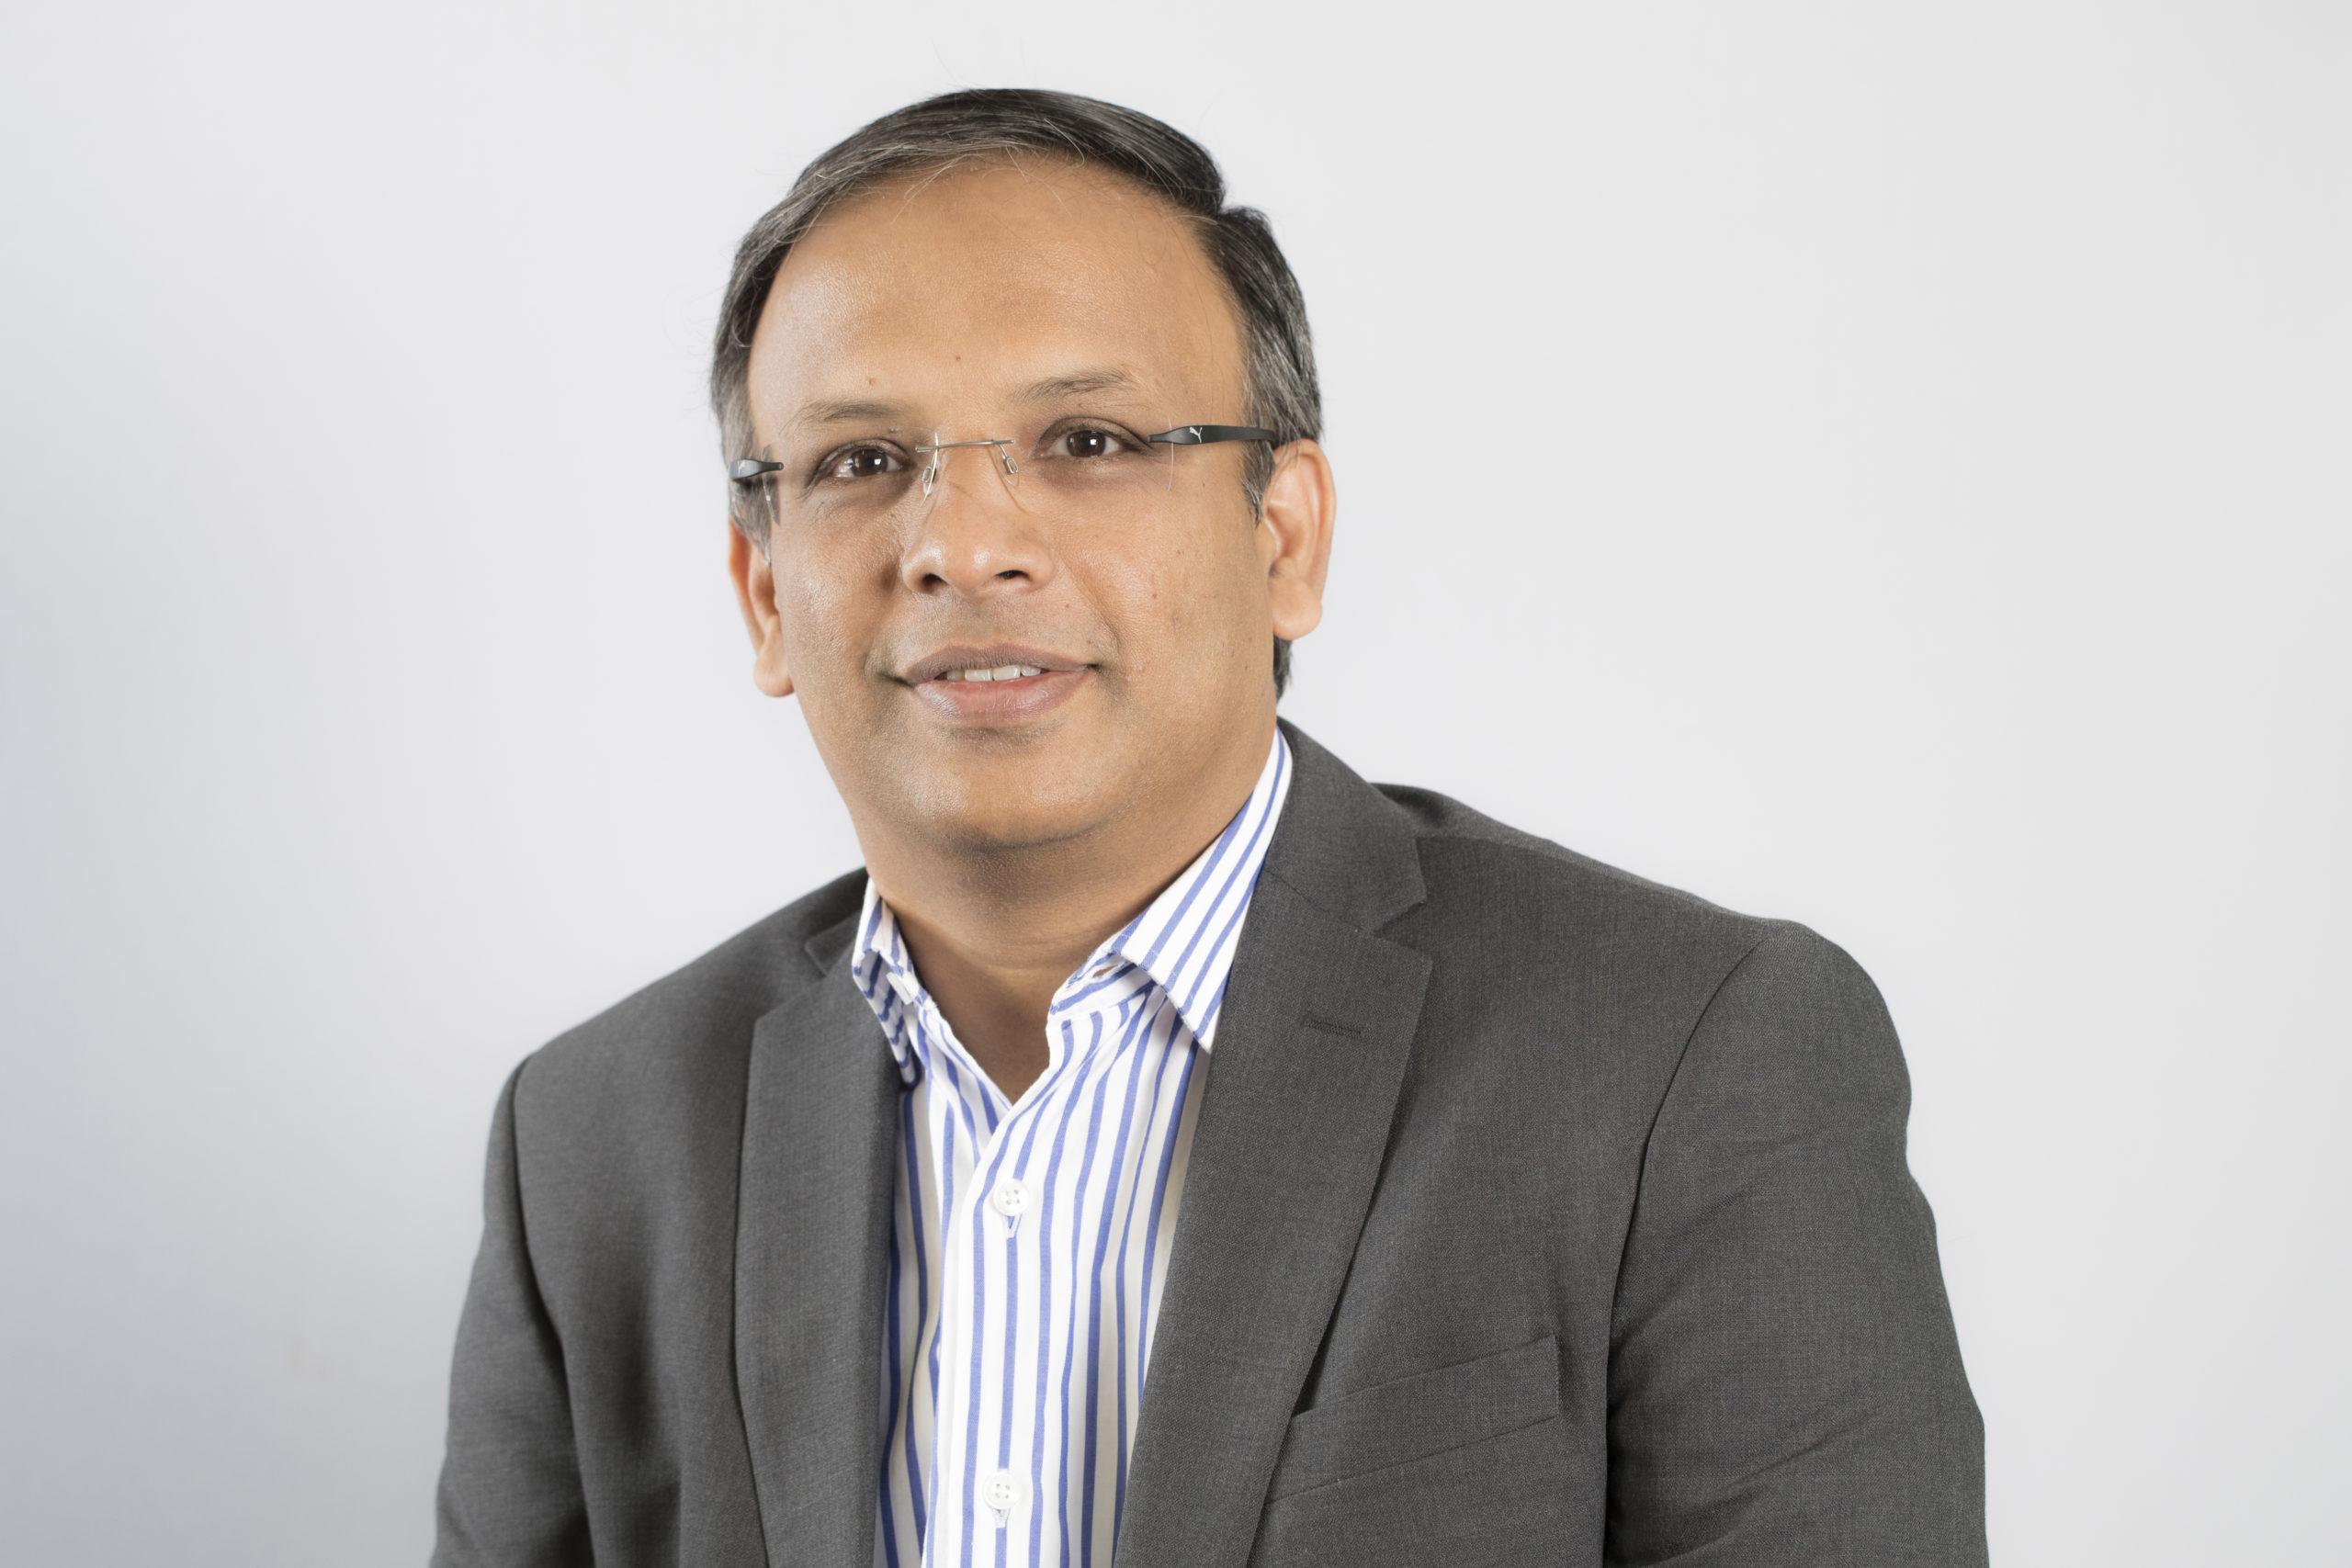 Srinivasan CR, Chief Digital Officer, Tata Communications